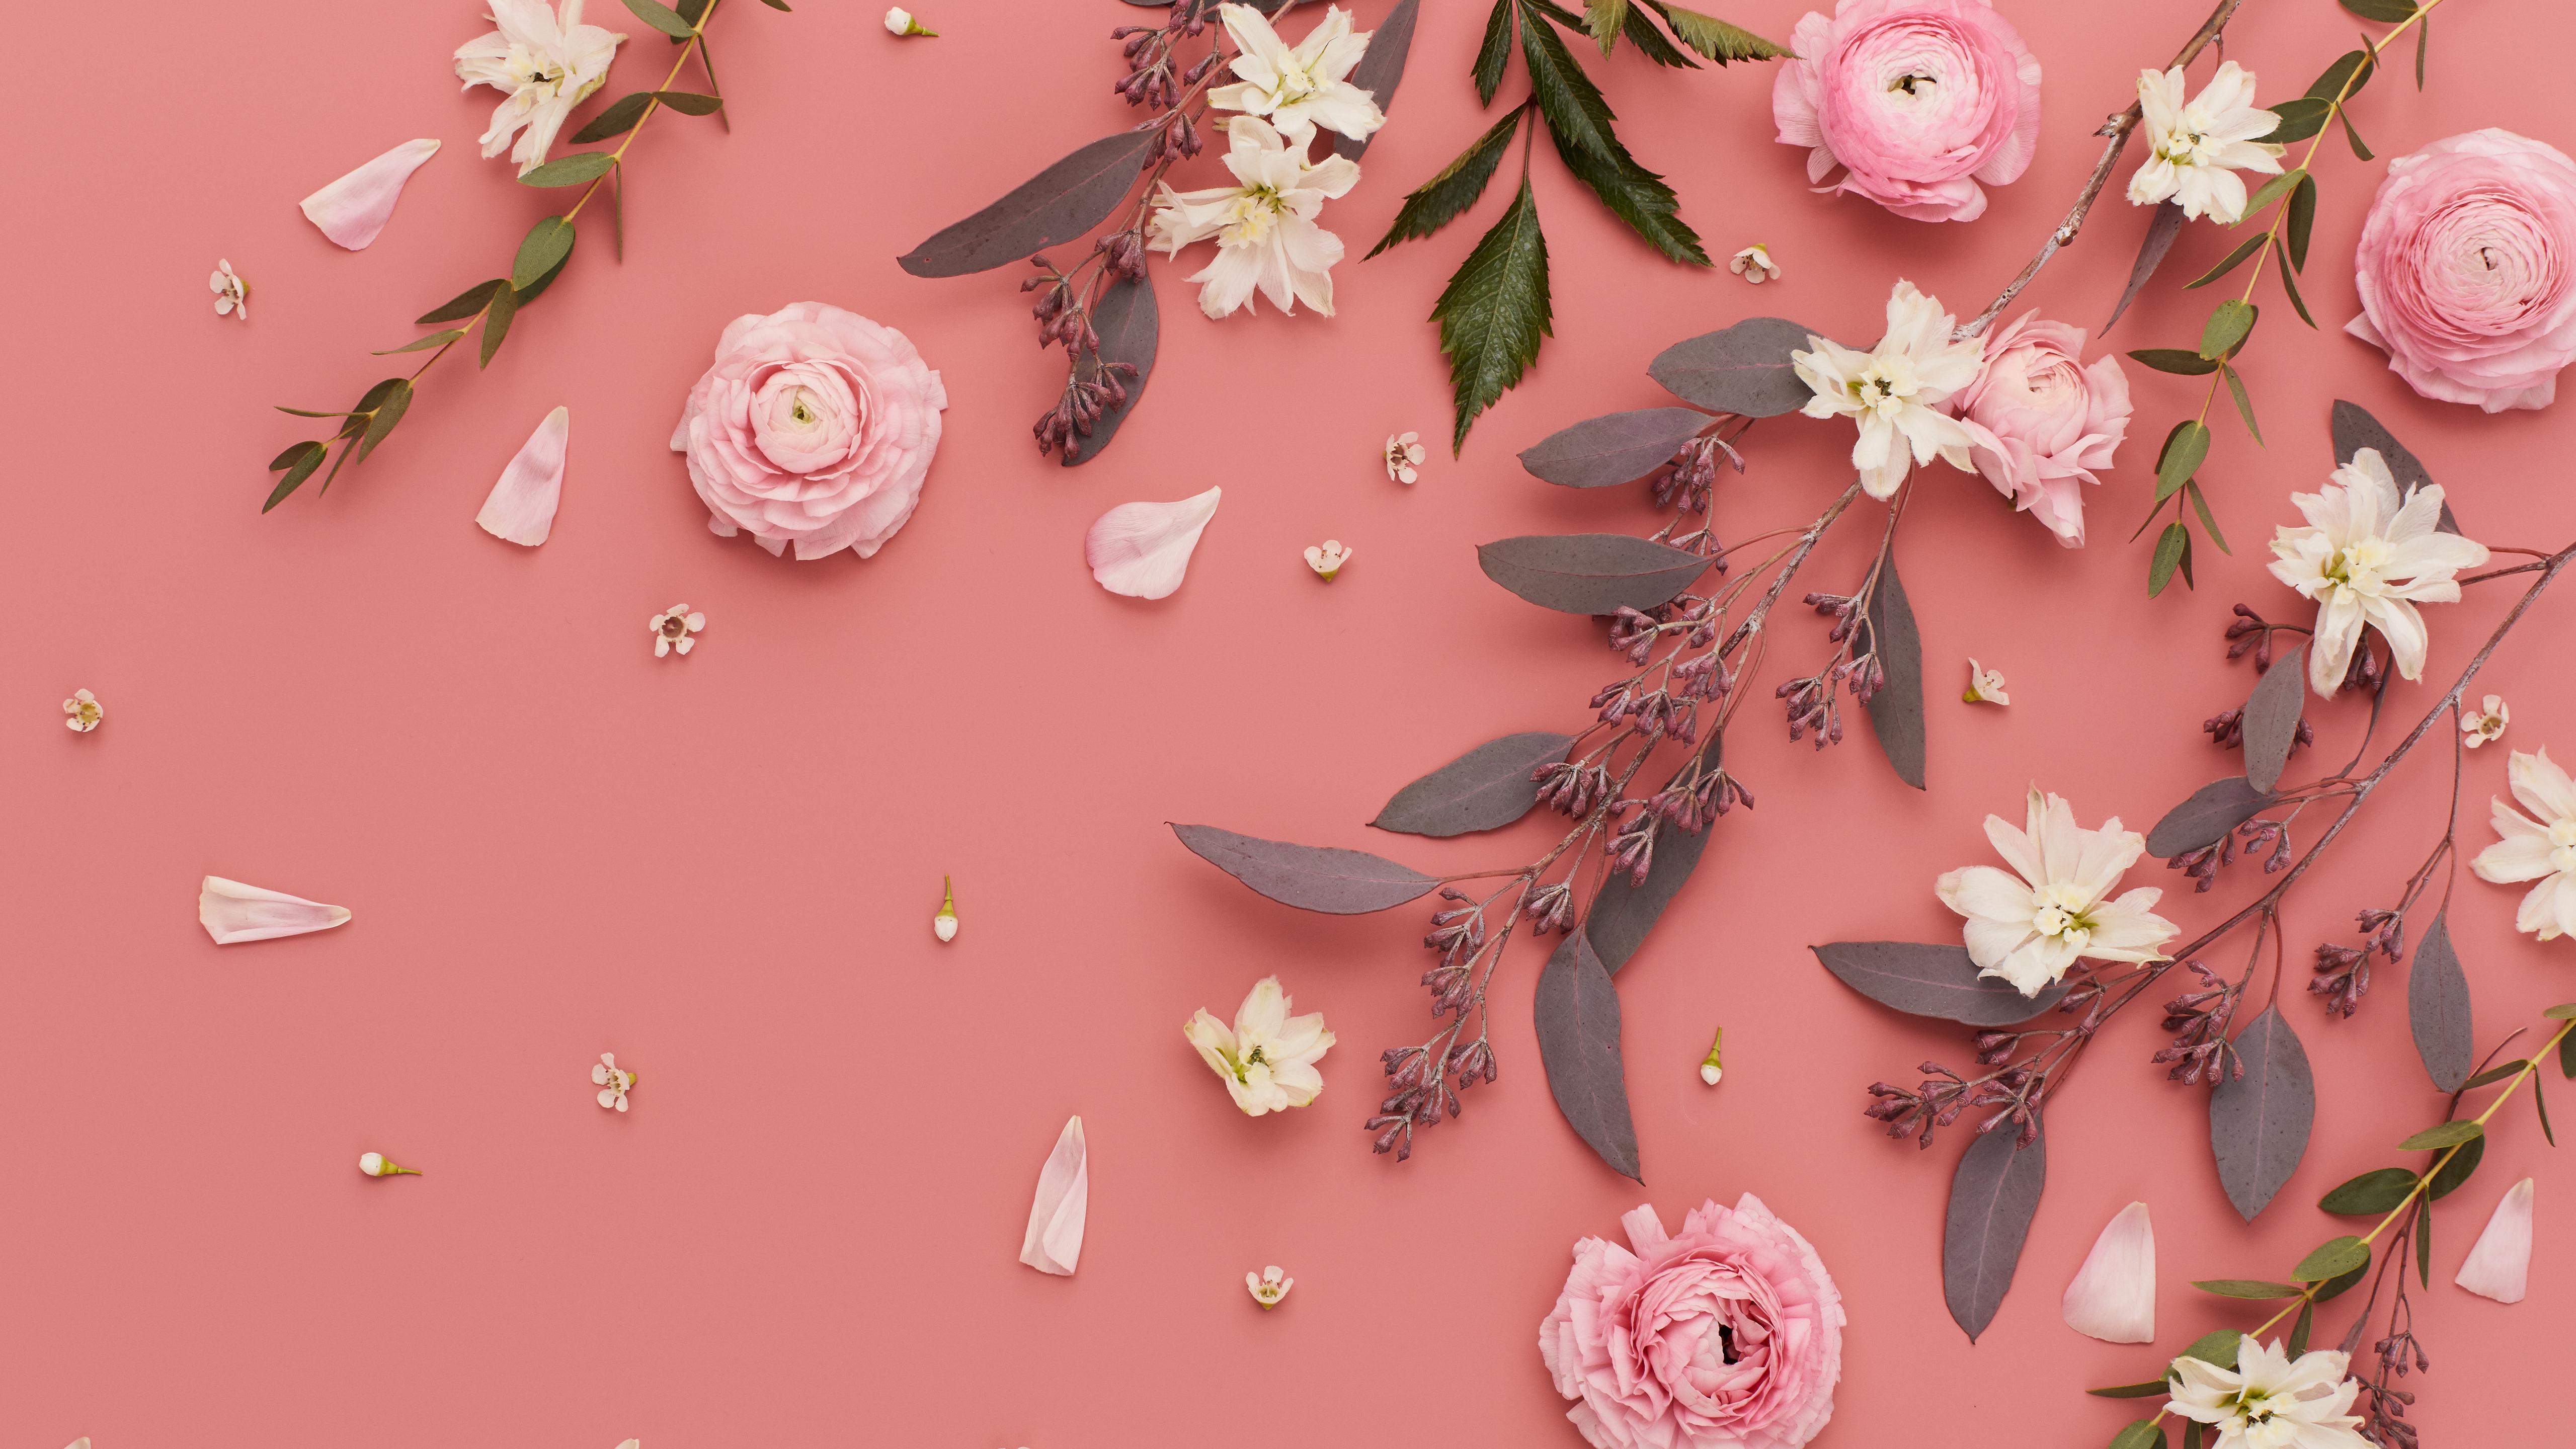 Pink Flowers Mobile + Desktop Wallpaper - Front + Main